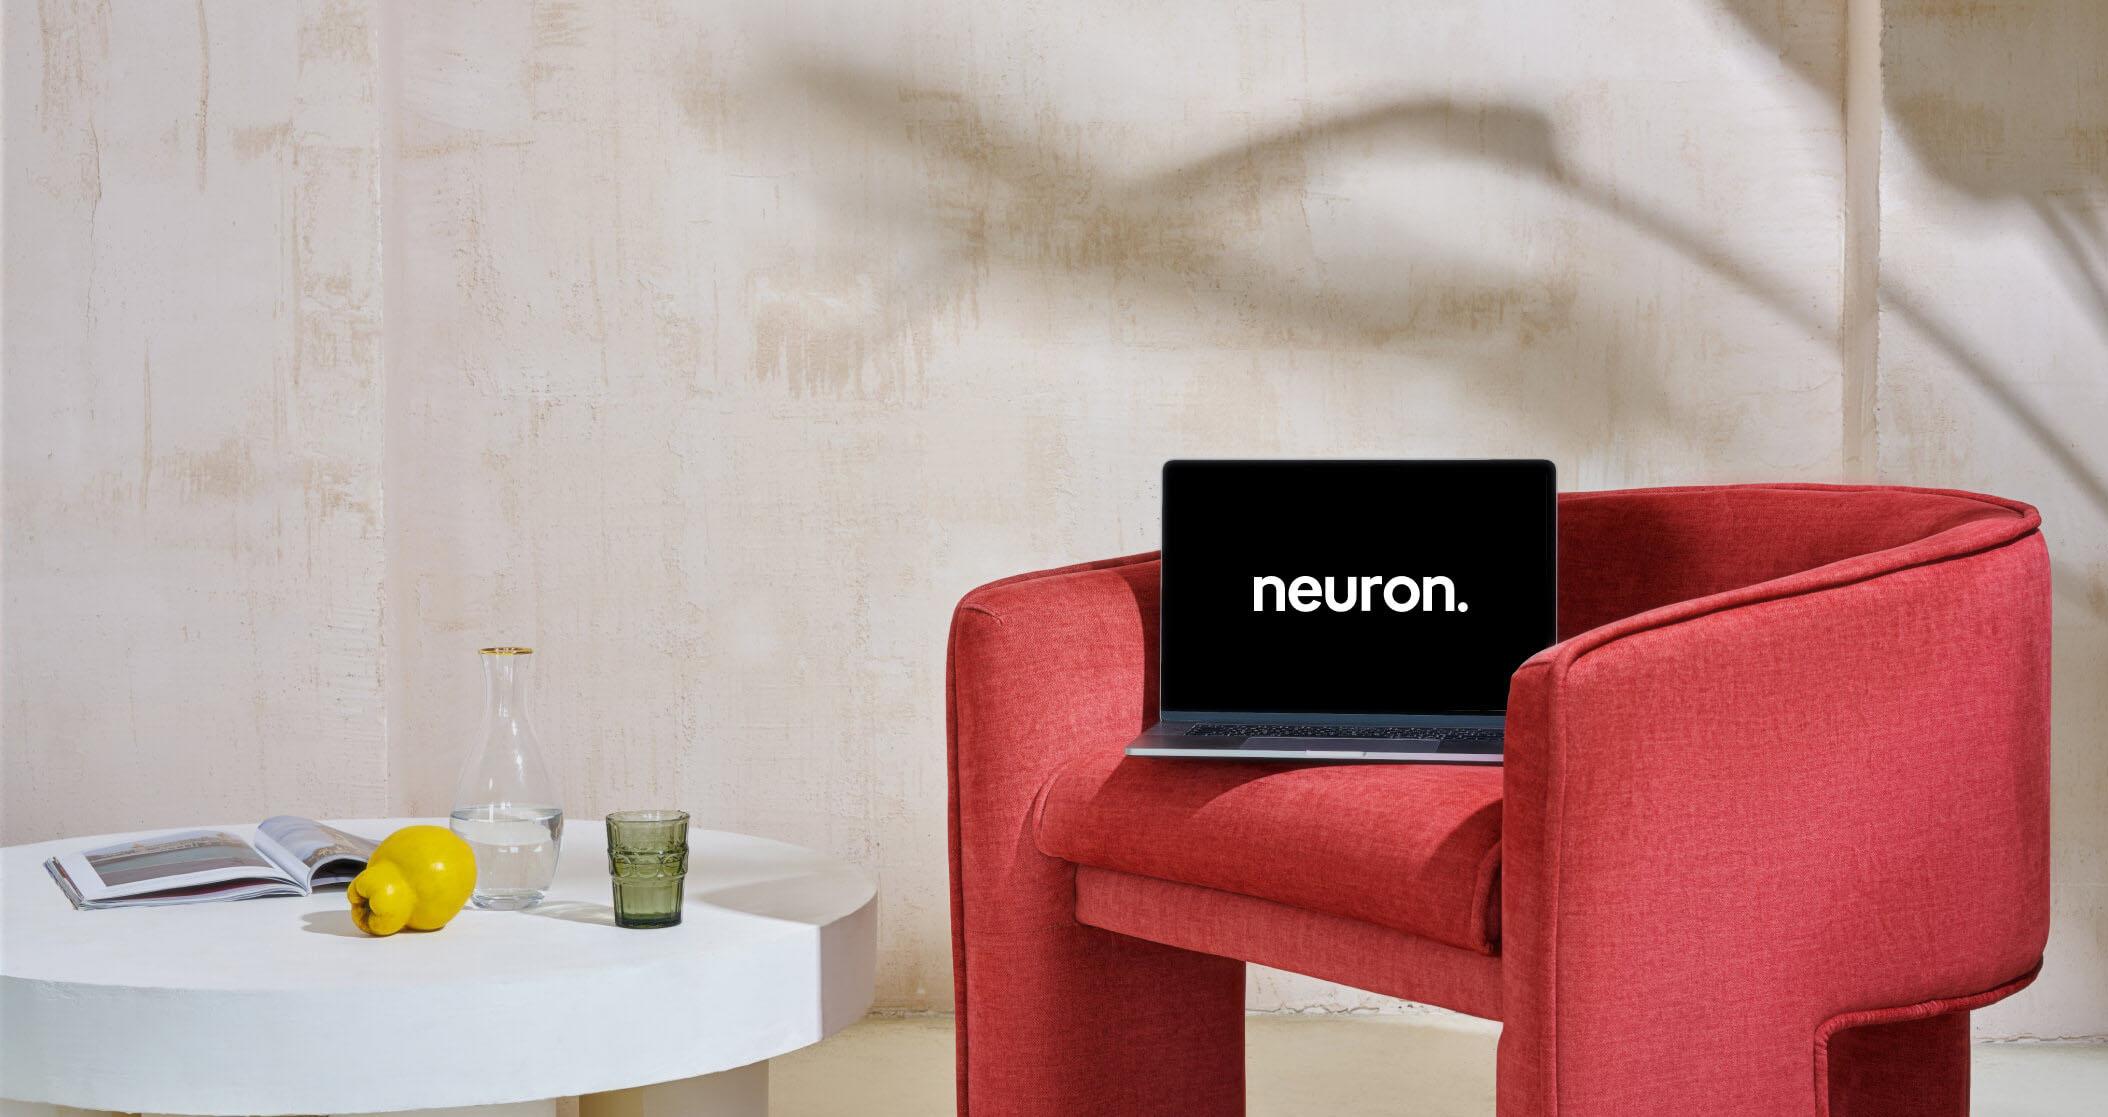 neuron about intro 1